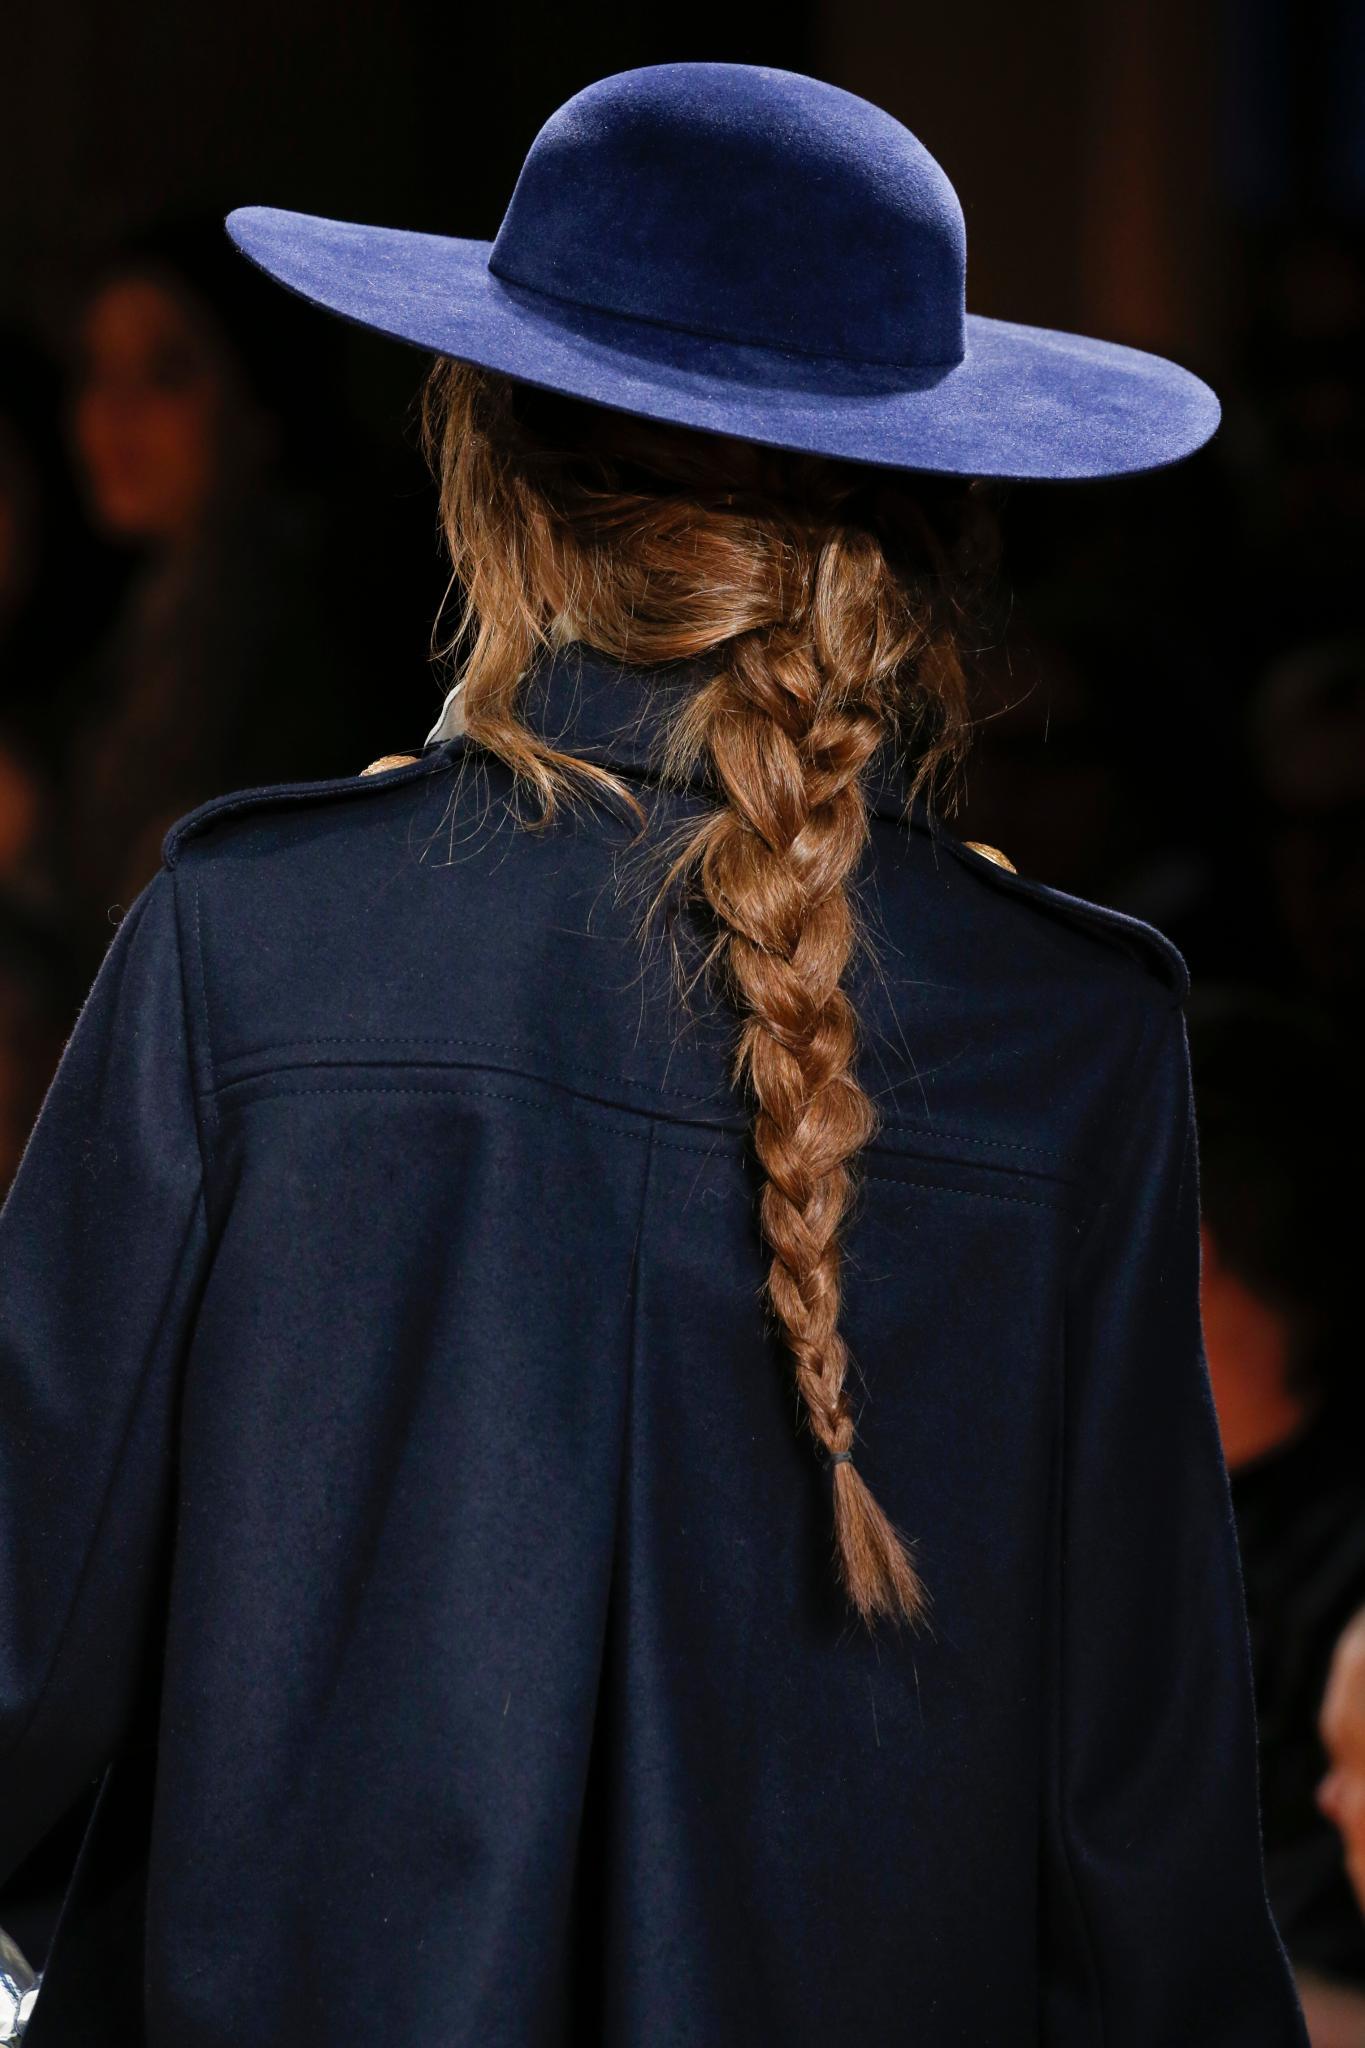 trenza suelta pelo largo castaño mechones sombrero accesorio alberta ferretti